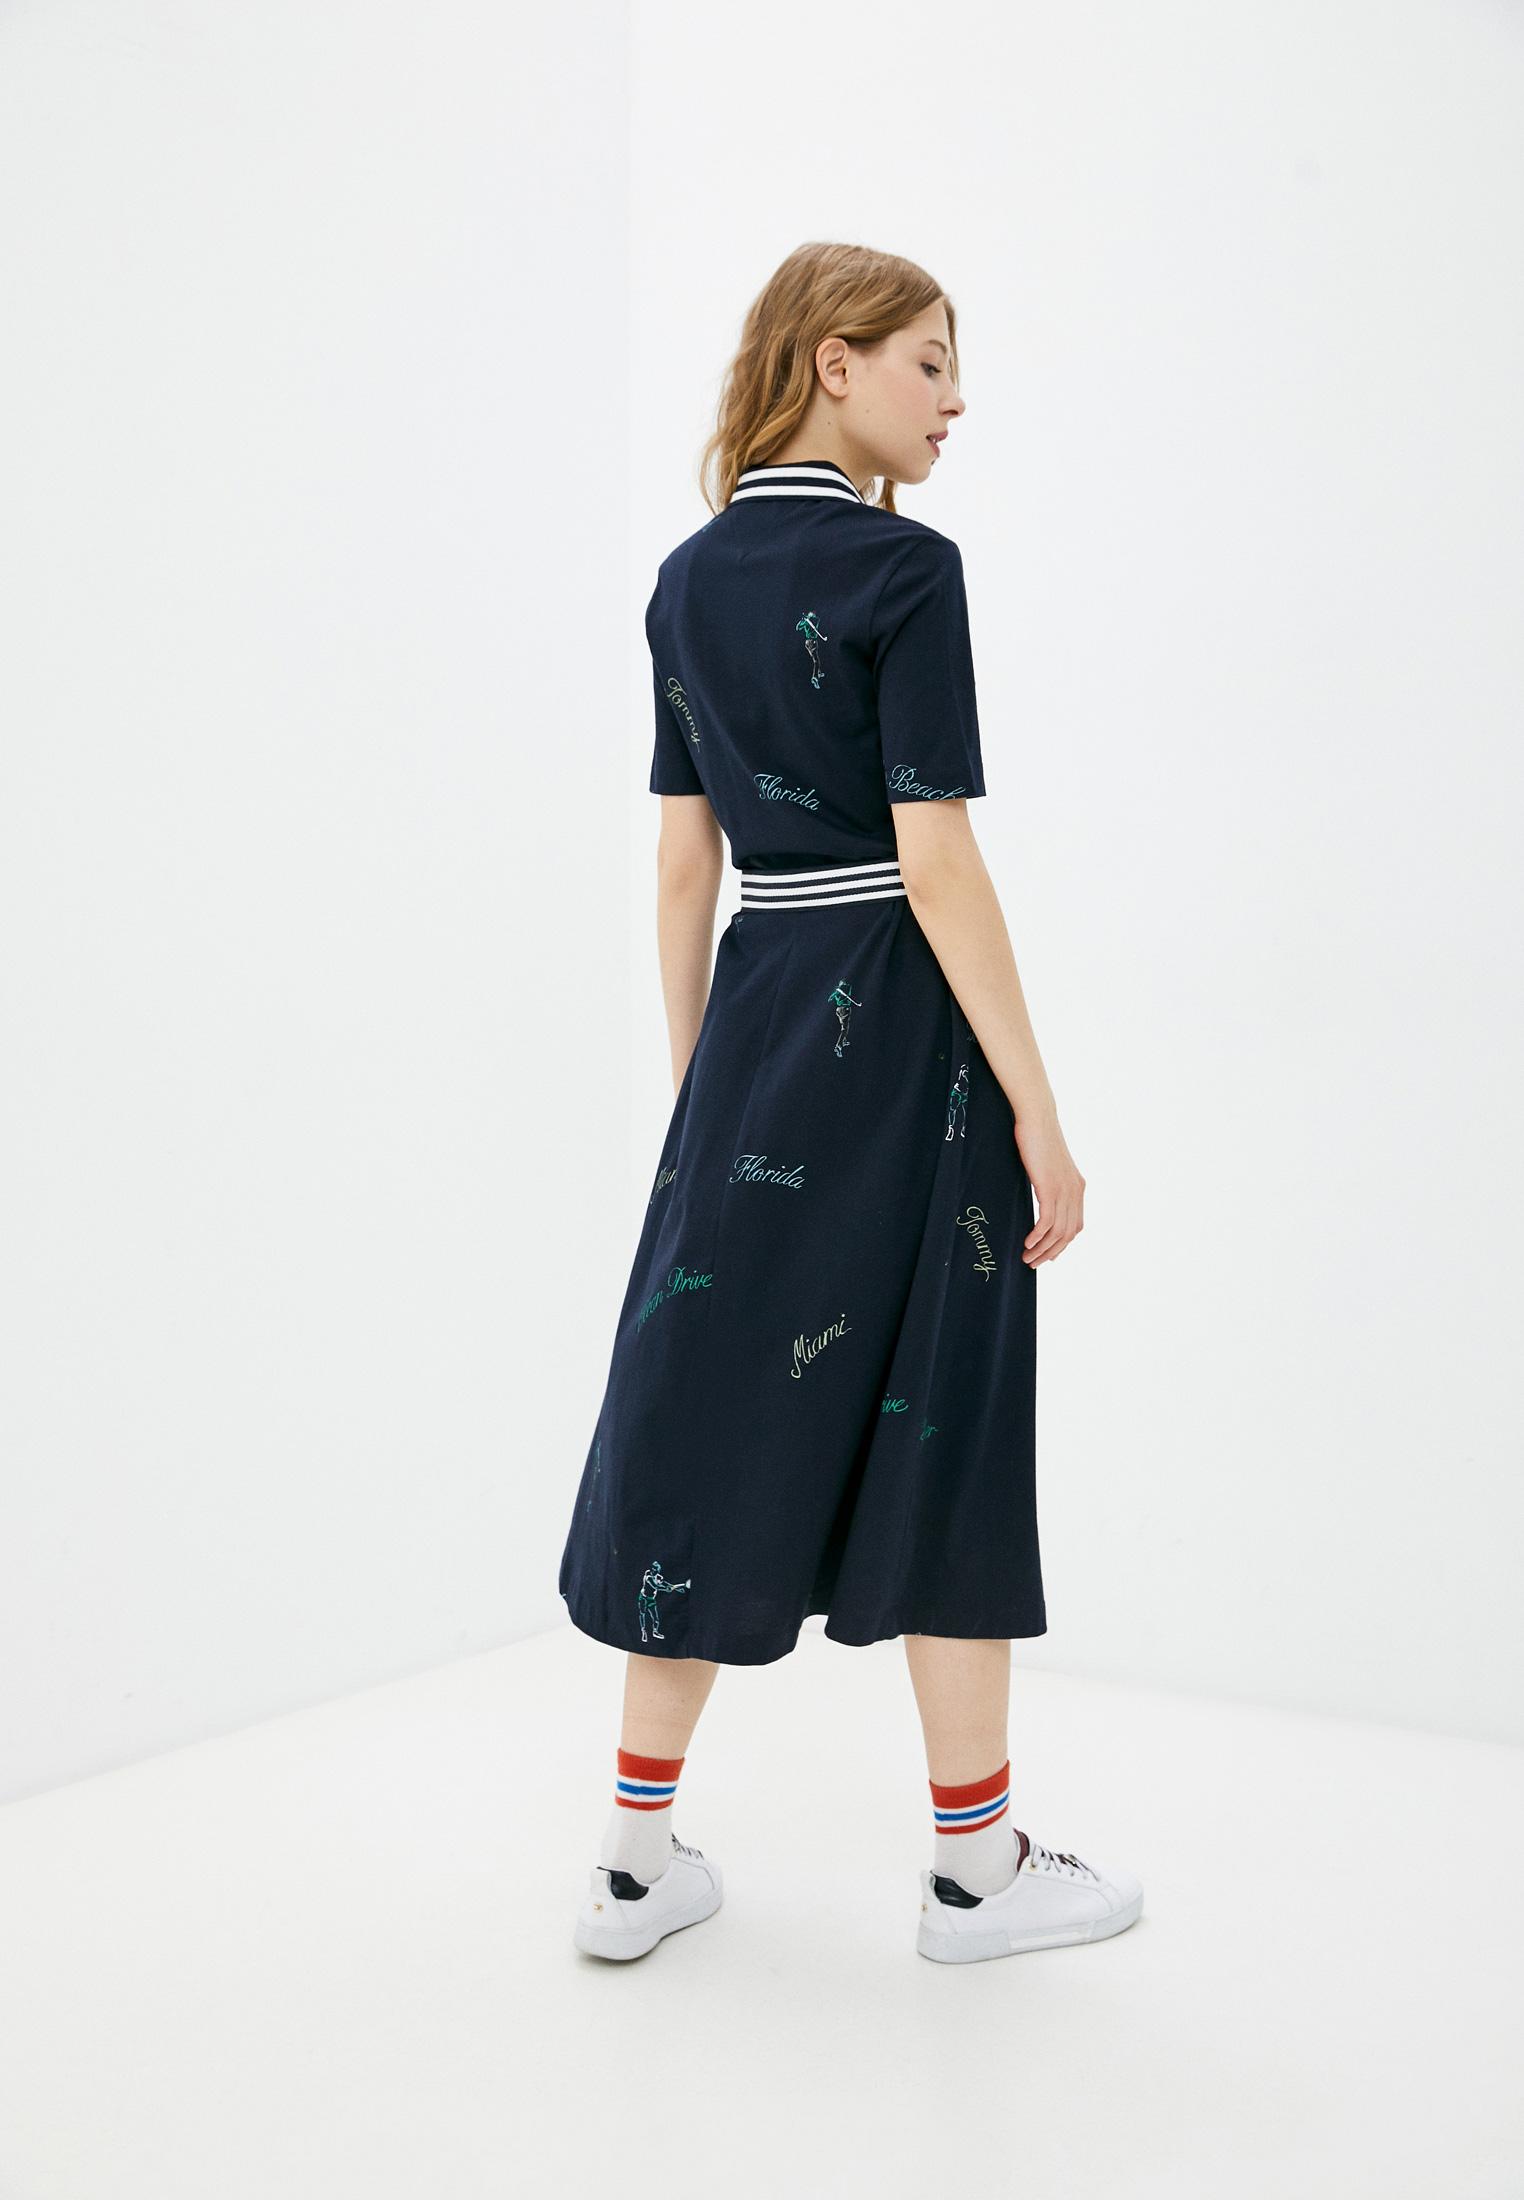 Платье Tommy Hilfiger (Томми Хилфигер) WW0WW30830: изображение 3